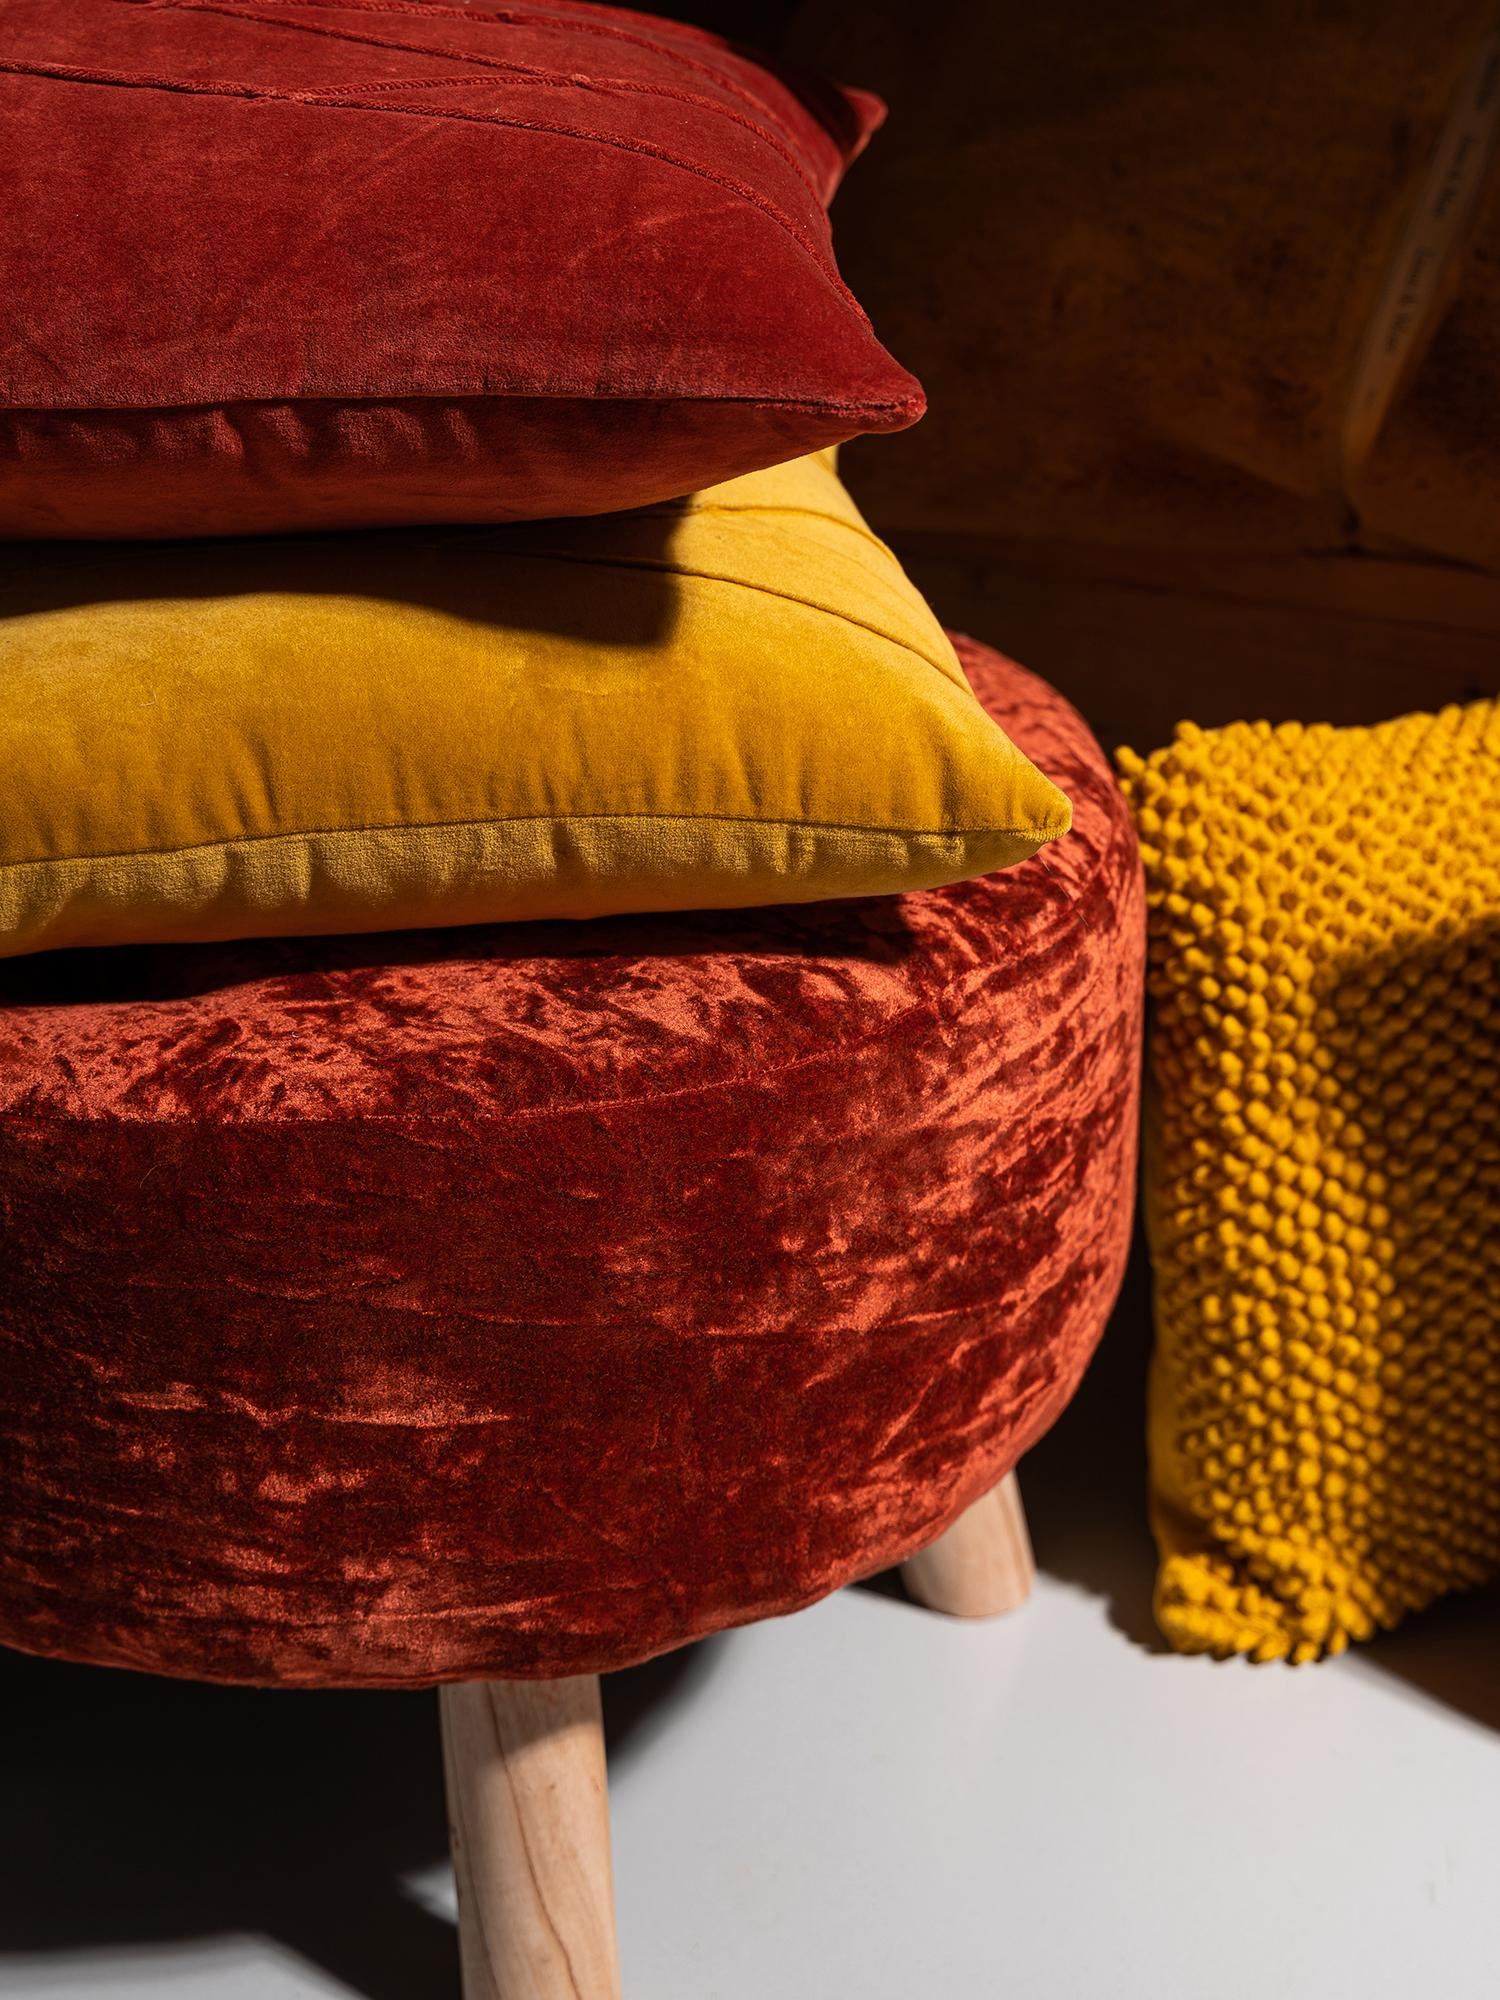 Samt-Kissen Pintuck, mit Inlett, Bezug: 55% Rayon, 45% Baumwolle, Webart: Samt, Bordeauxrot, 45 x 45 cm